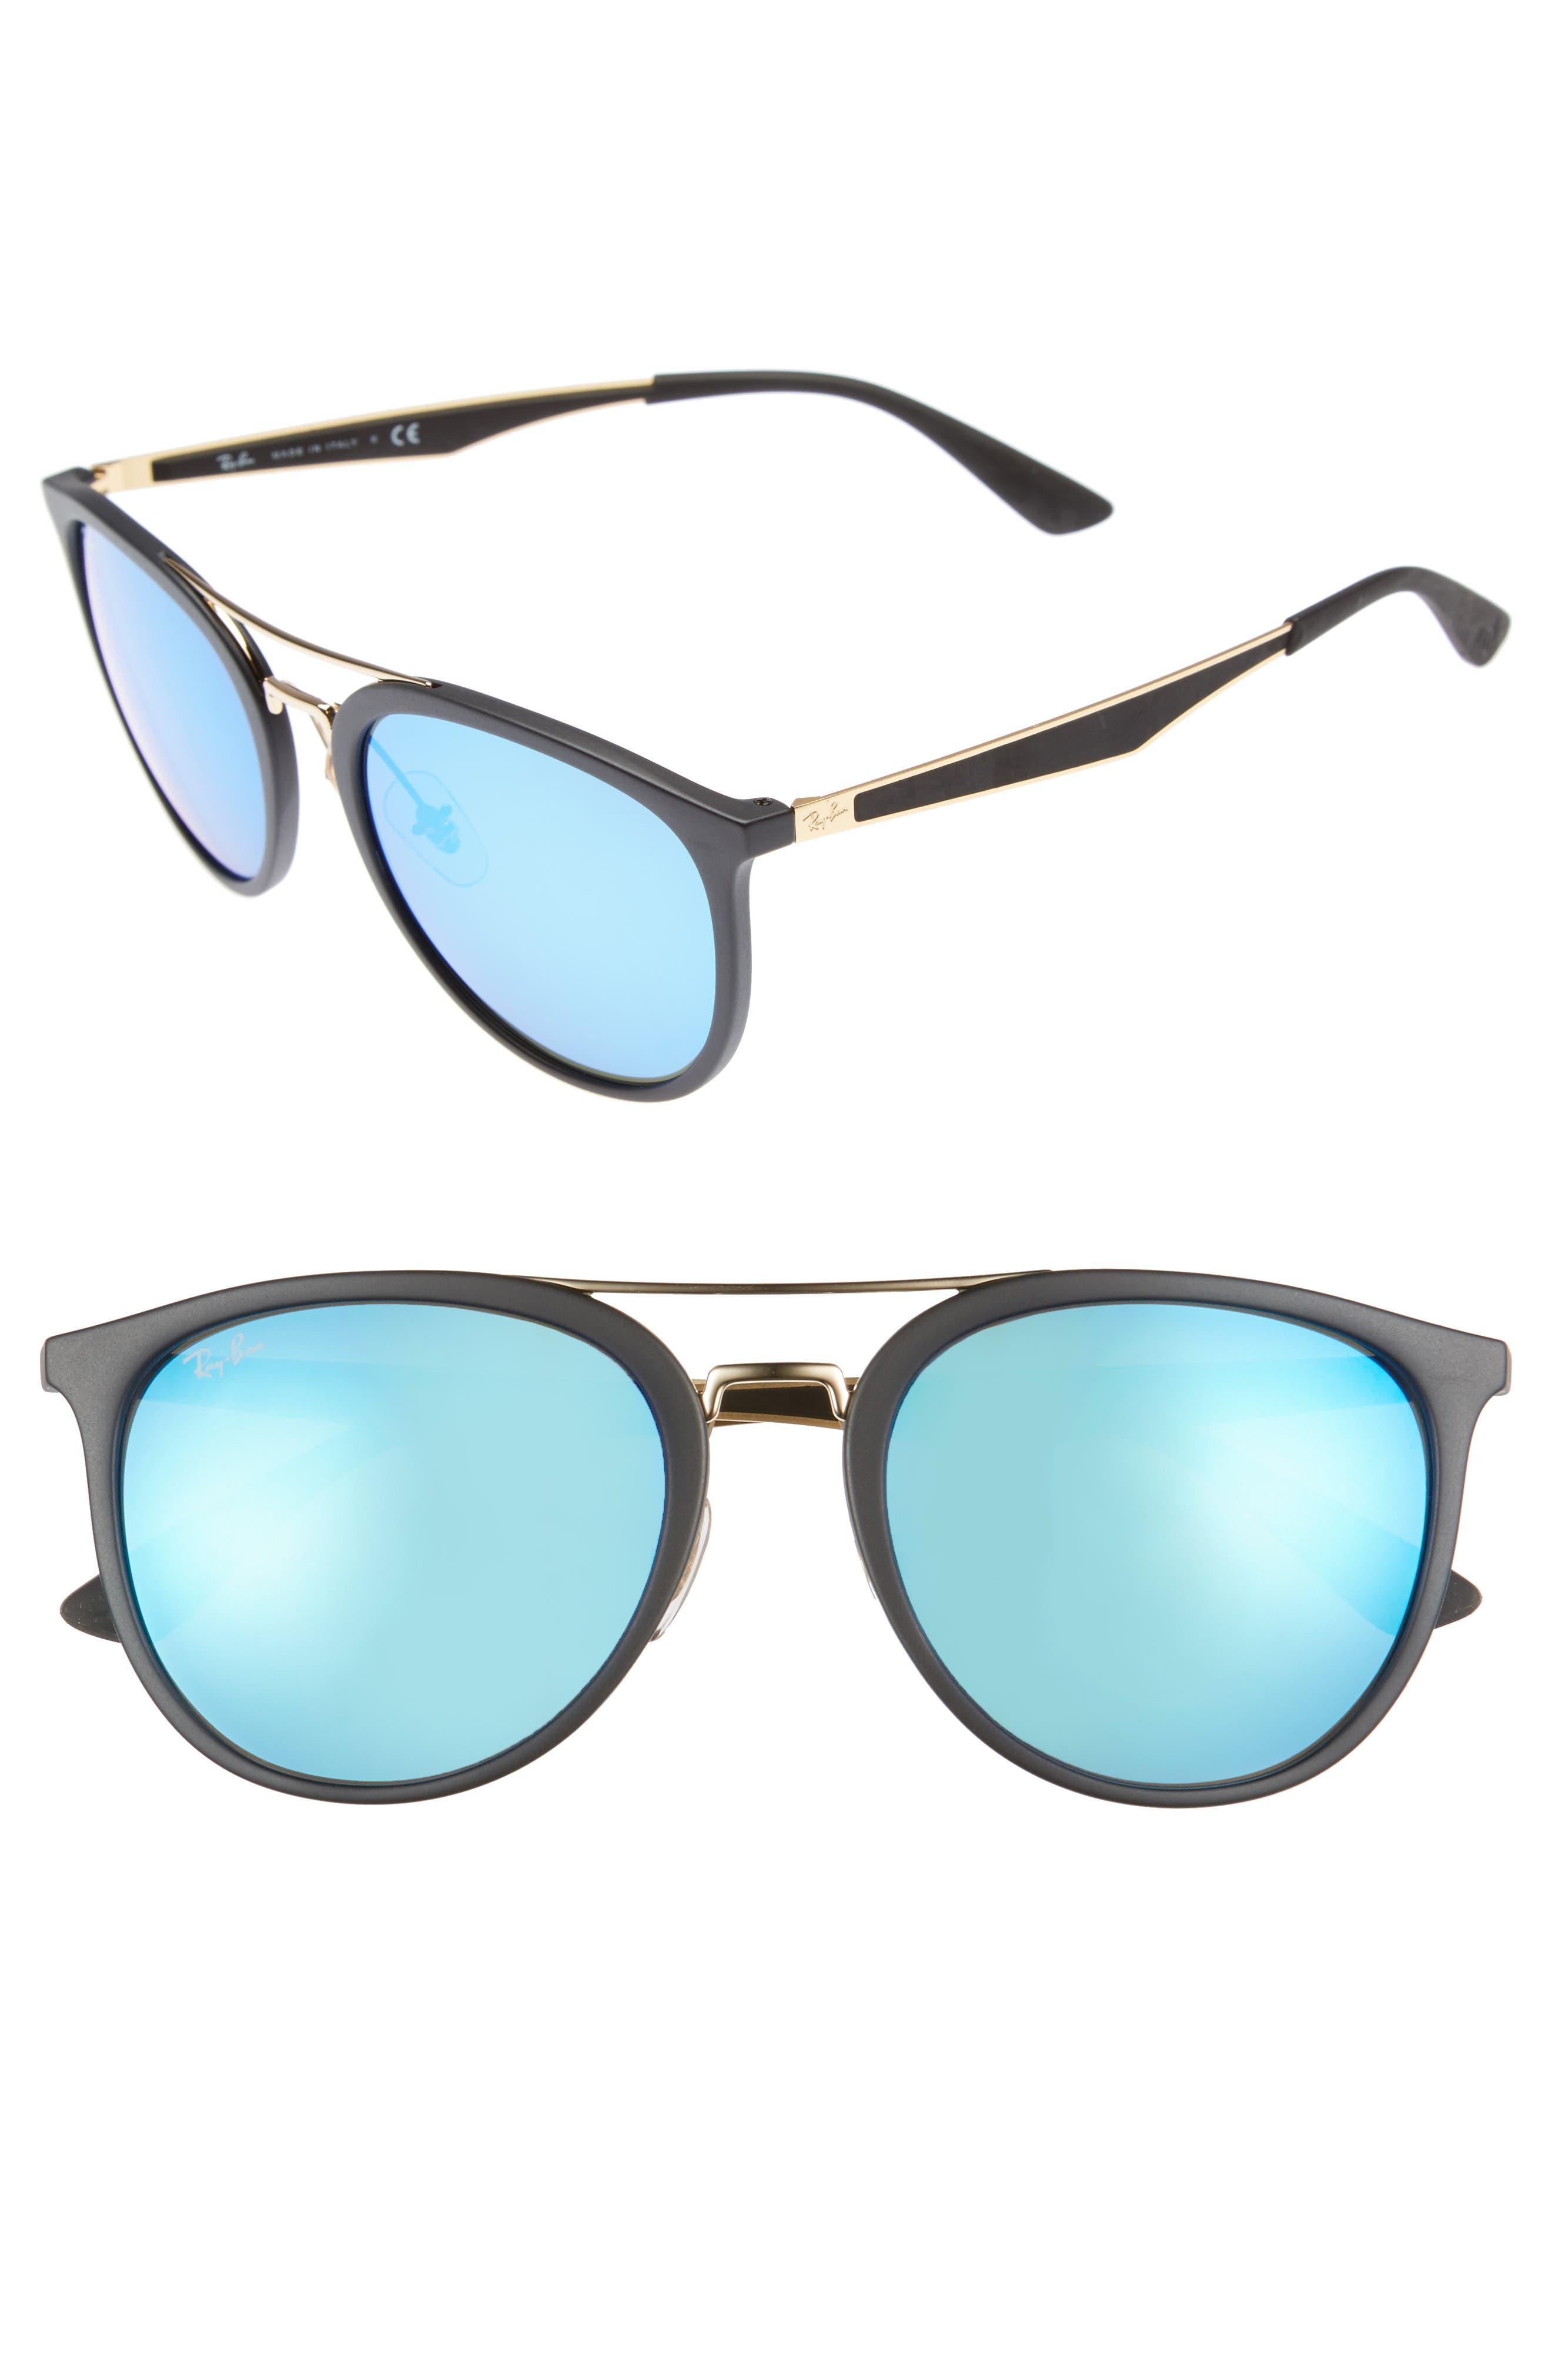 Ray-Ban 55Mm Retro Sunglasses - Black Blue